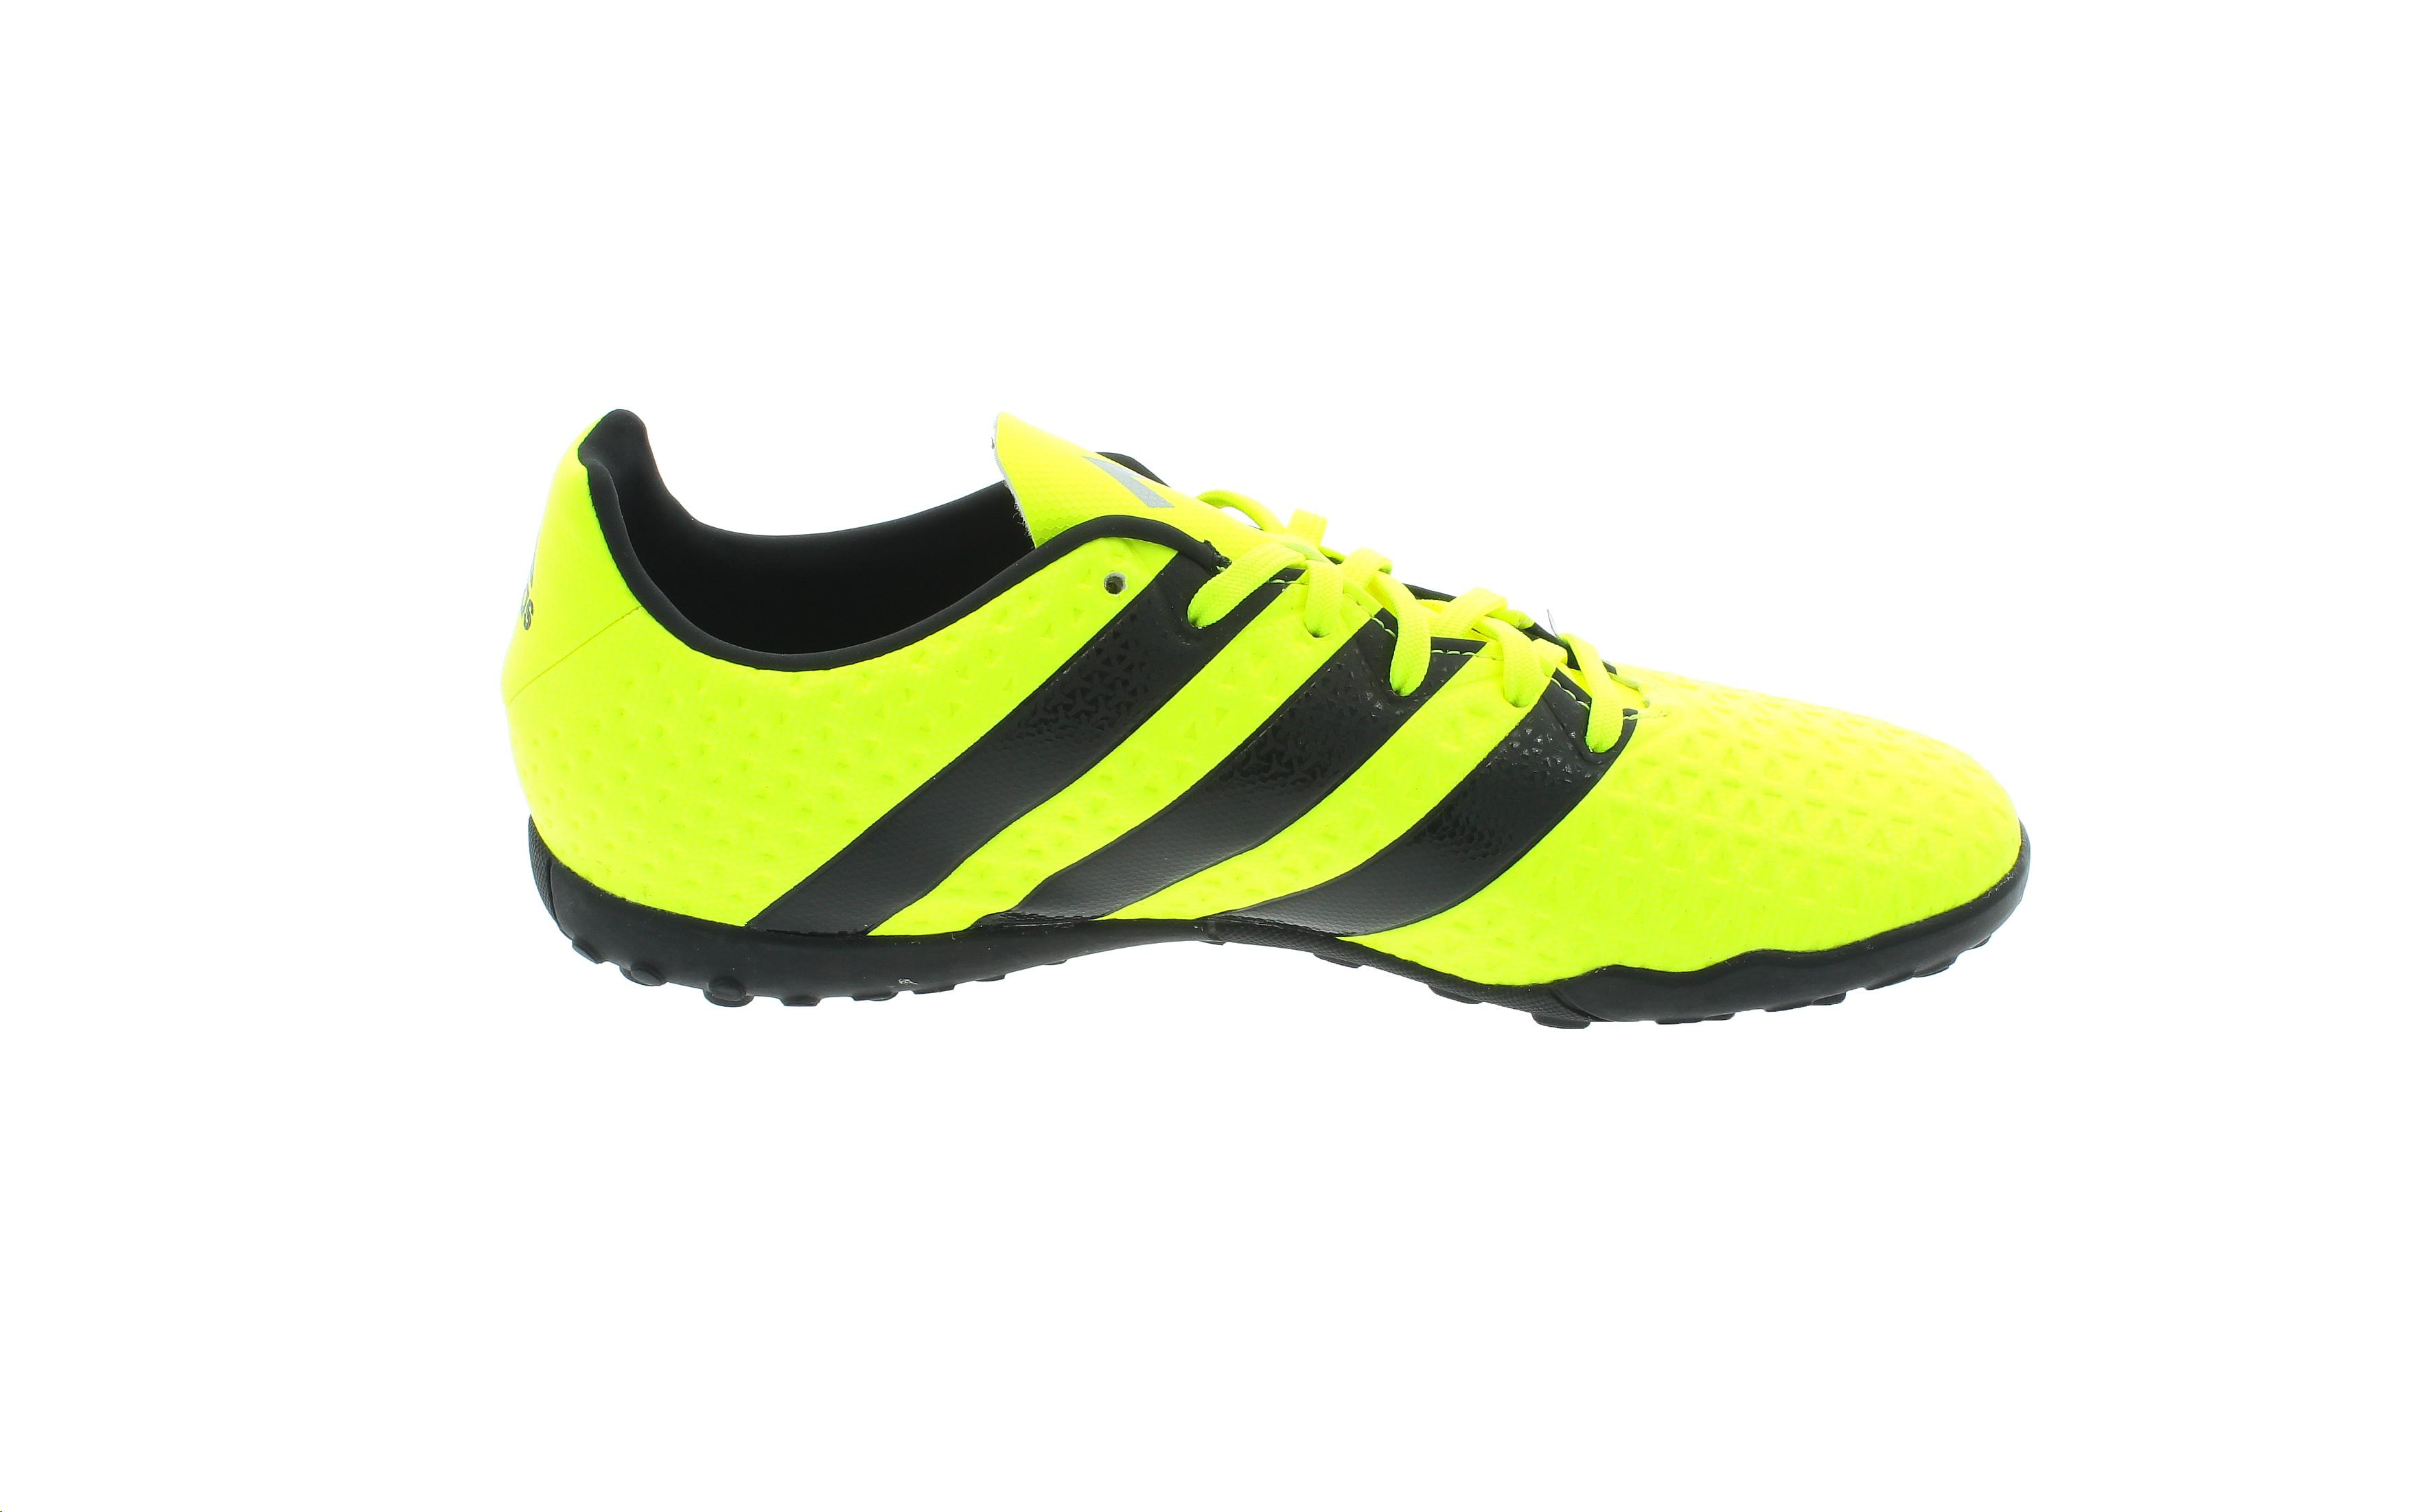 quality design ebc41 b7d24 Botas Fútbol Adidas Ace 16.4 Tf J Amarillo Junior - Deportes